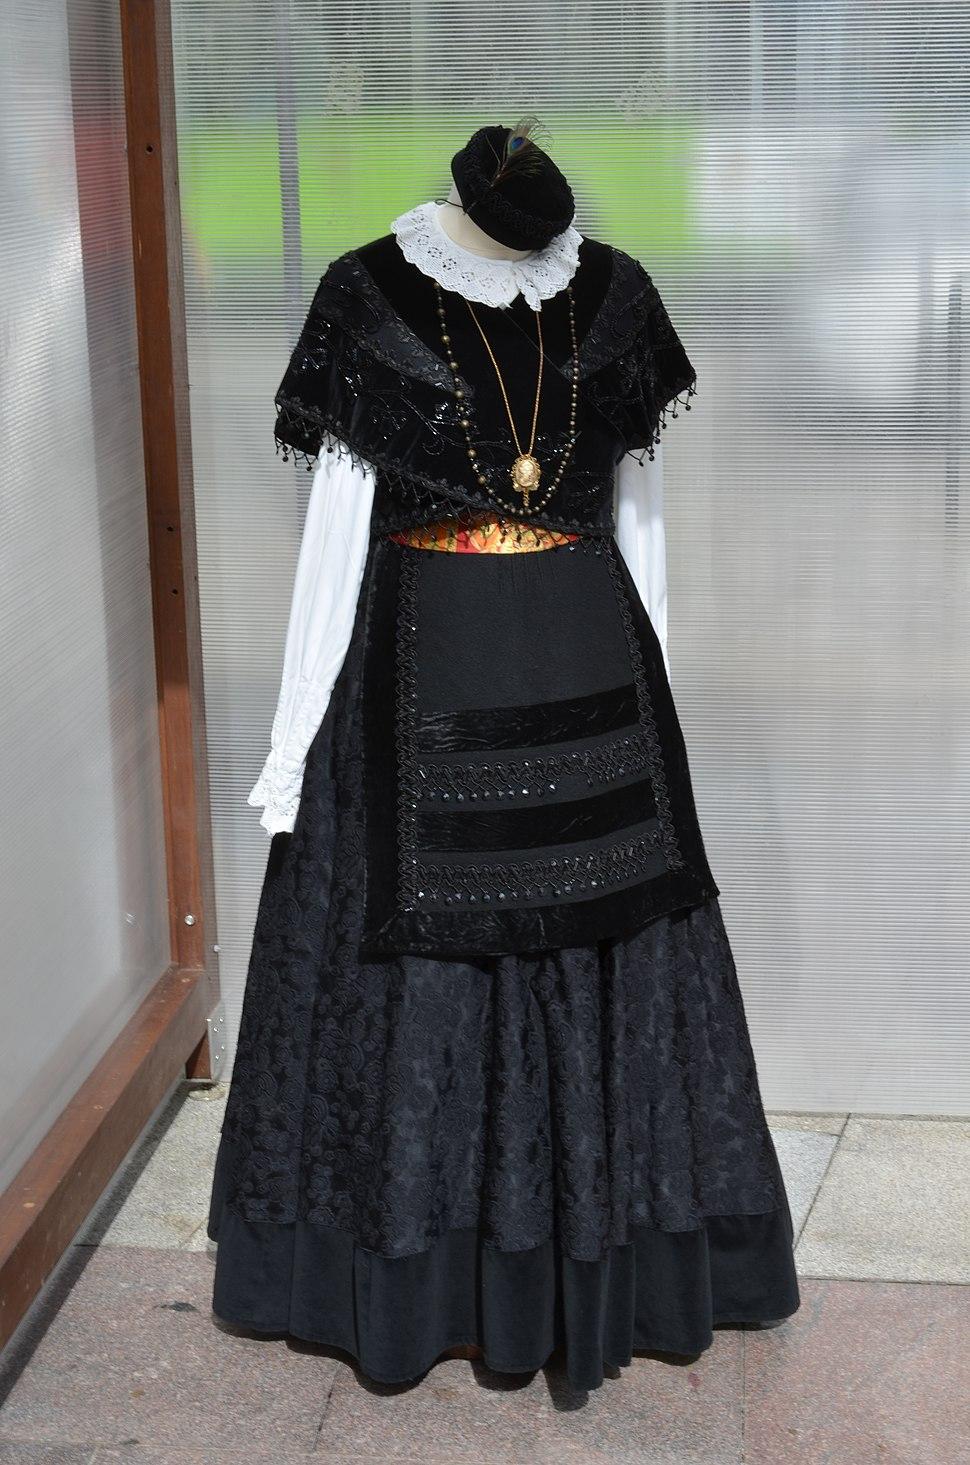 2014-10-18 - Galician Traditional Clothes - Vigo - Spain1